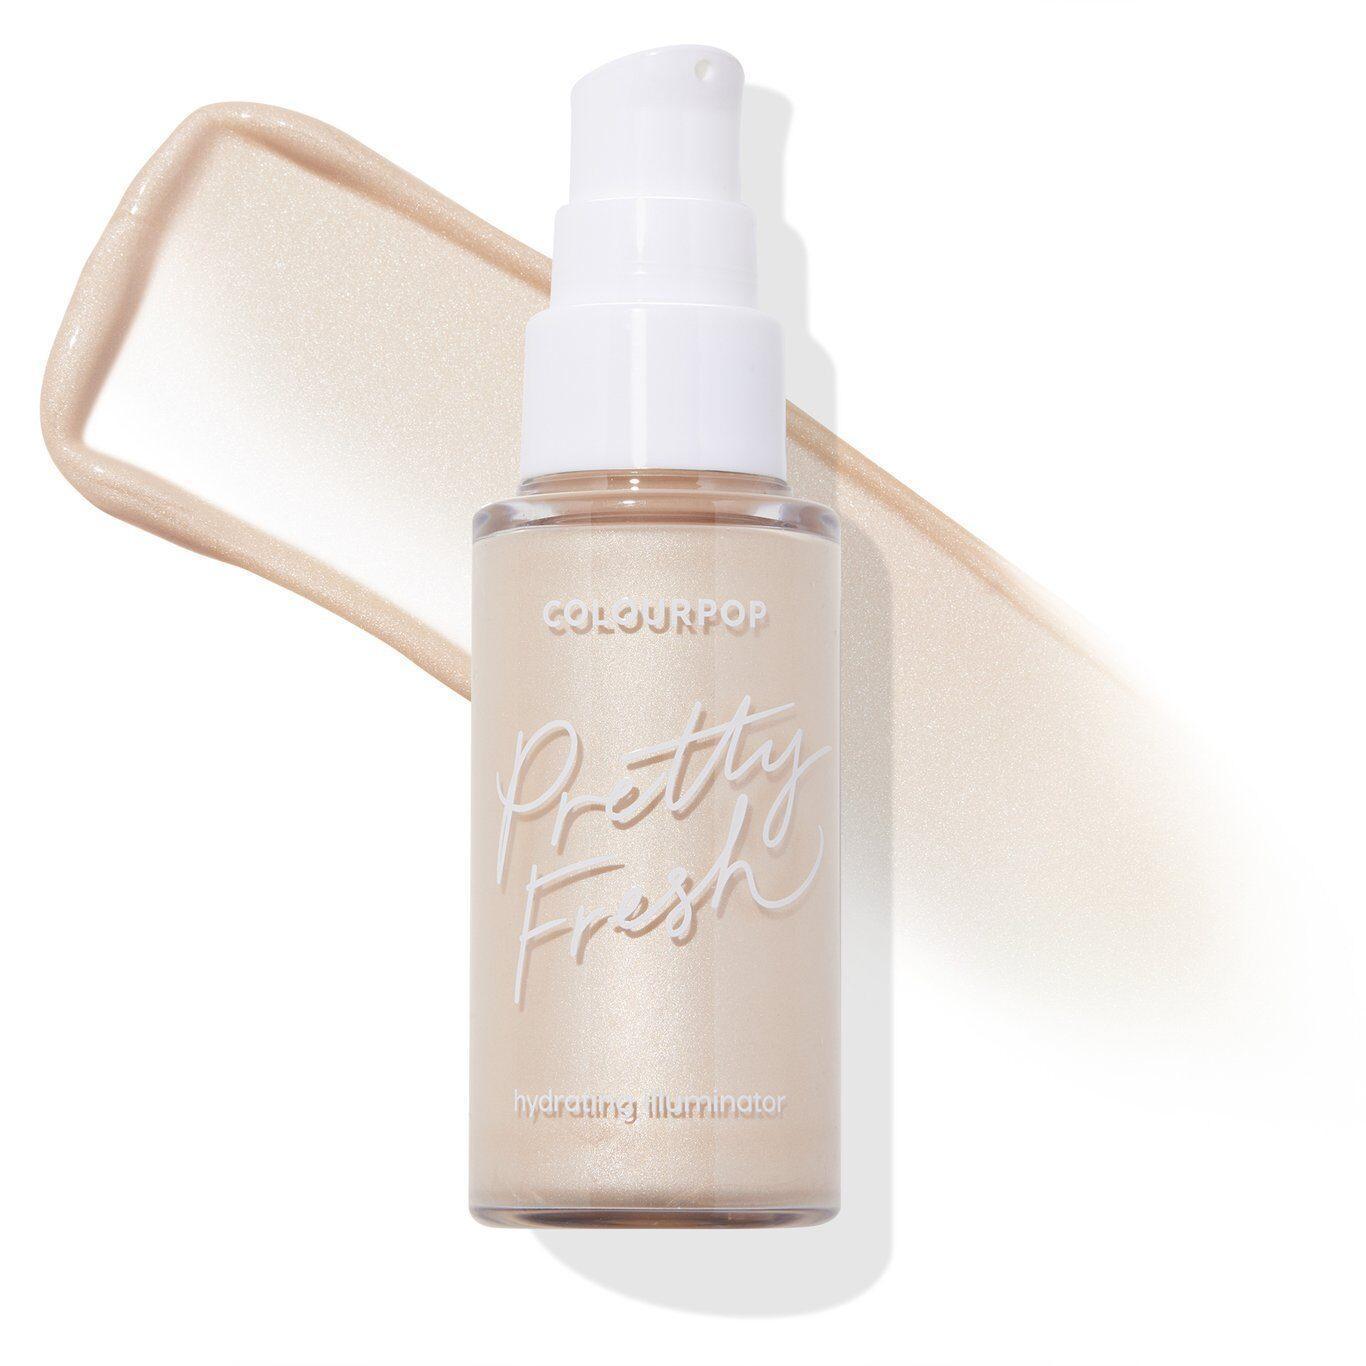 Colourpop Cosmetics Pretty Fresh Illuminator in Soft Ivory